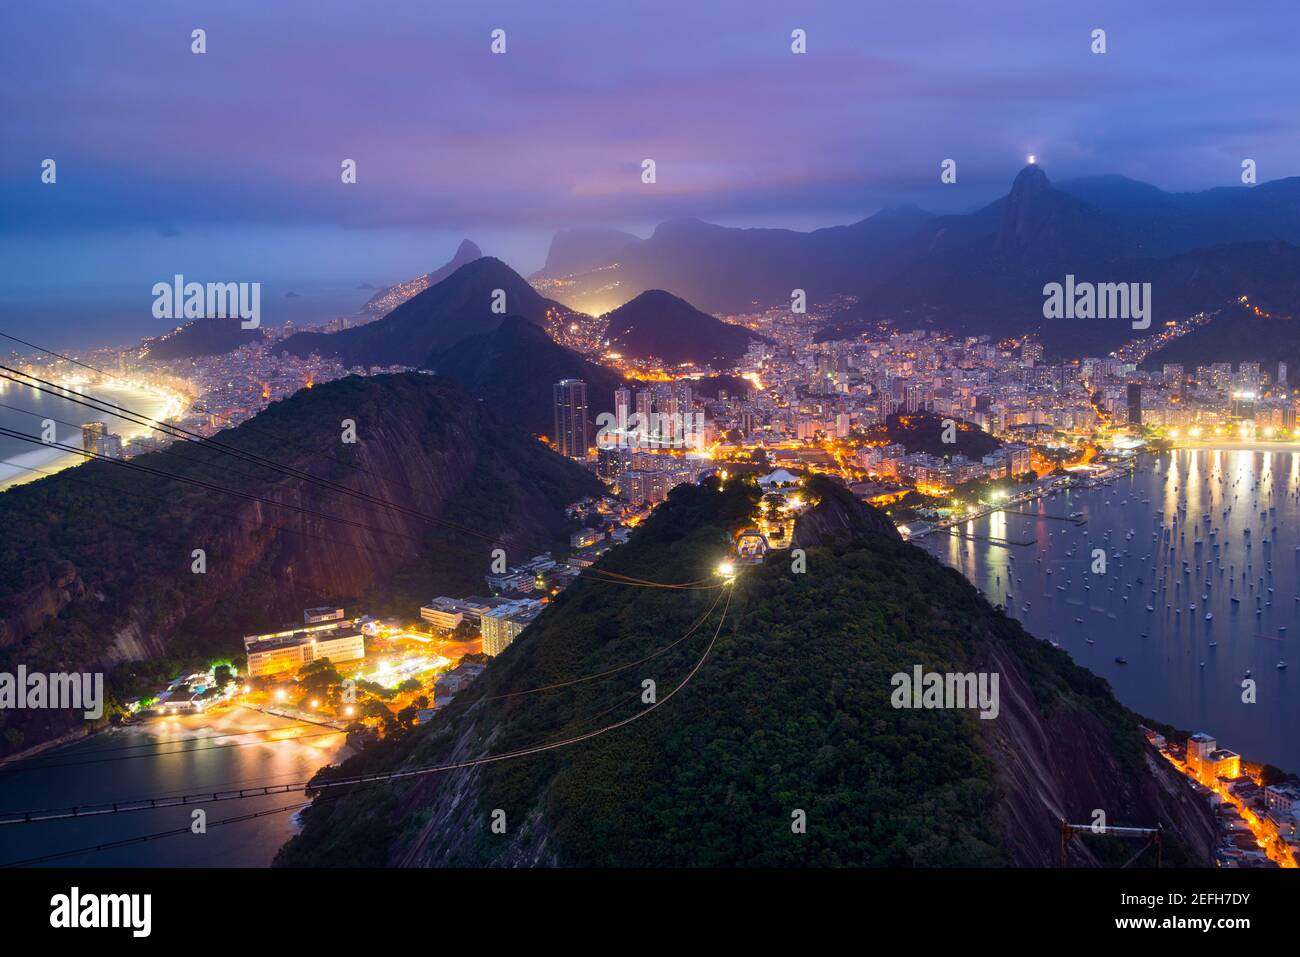 Rio de Janeiro from Sugarloaf Mountain - Brazil Stock Photo